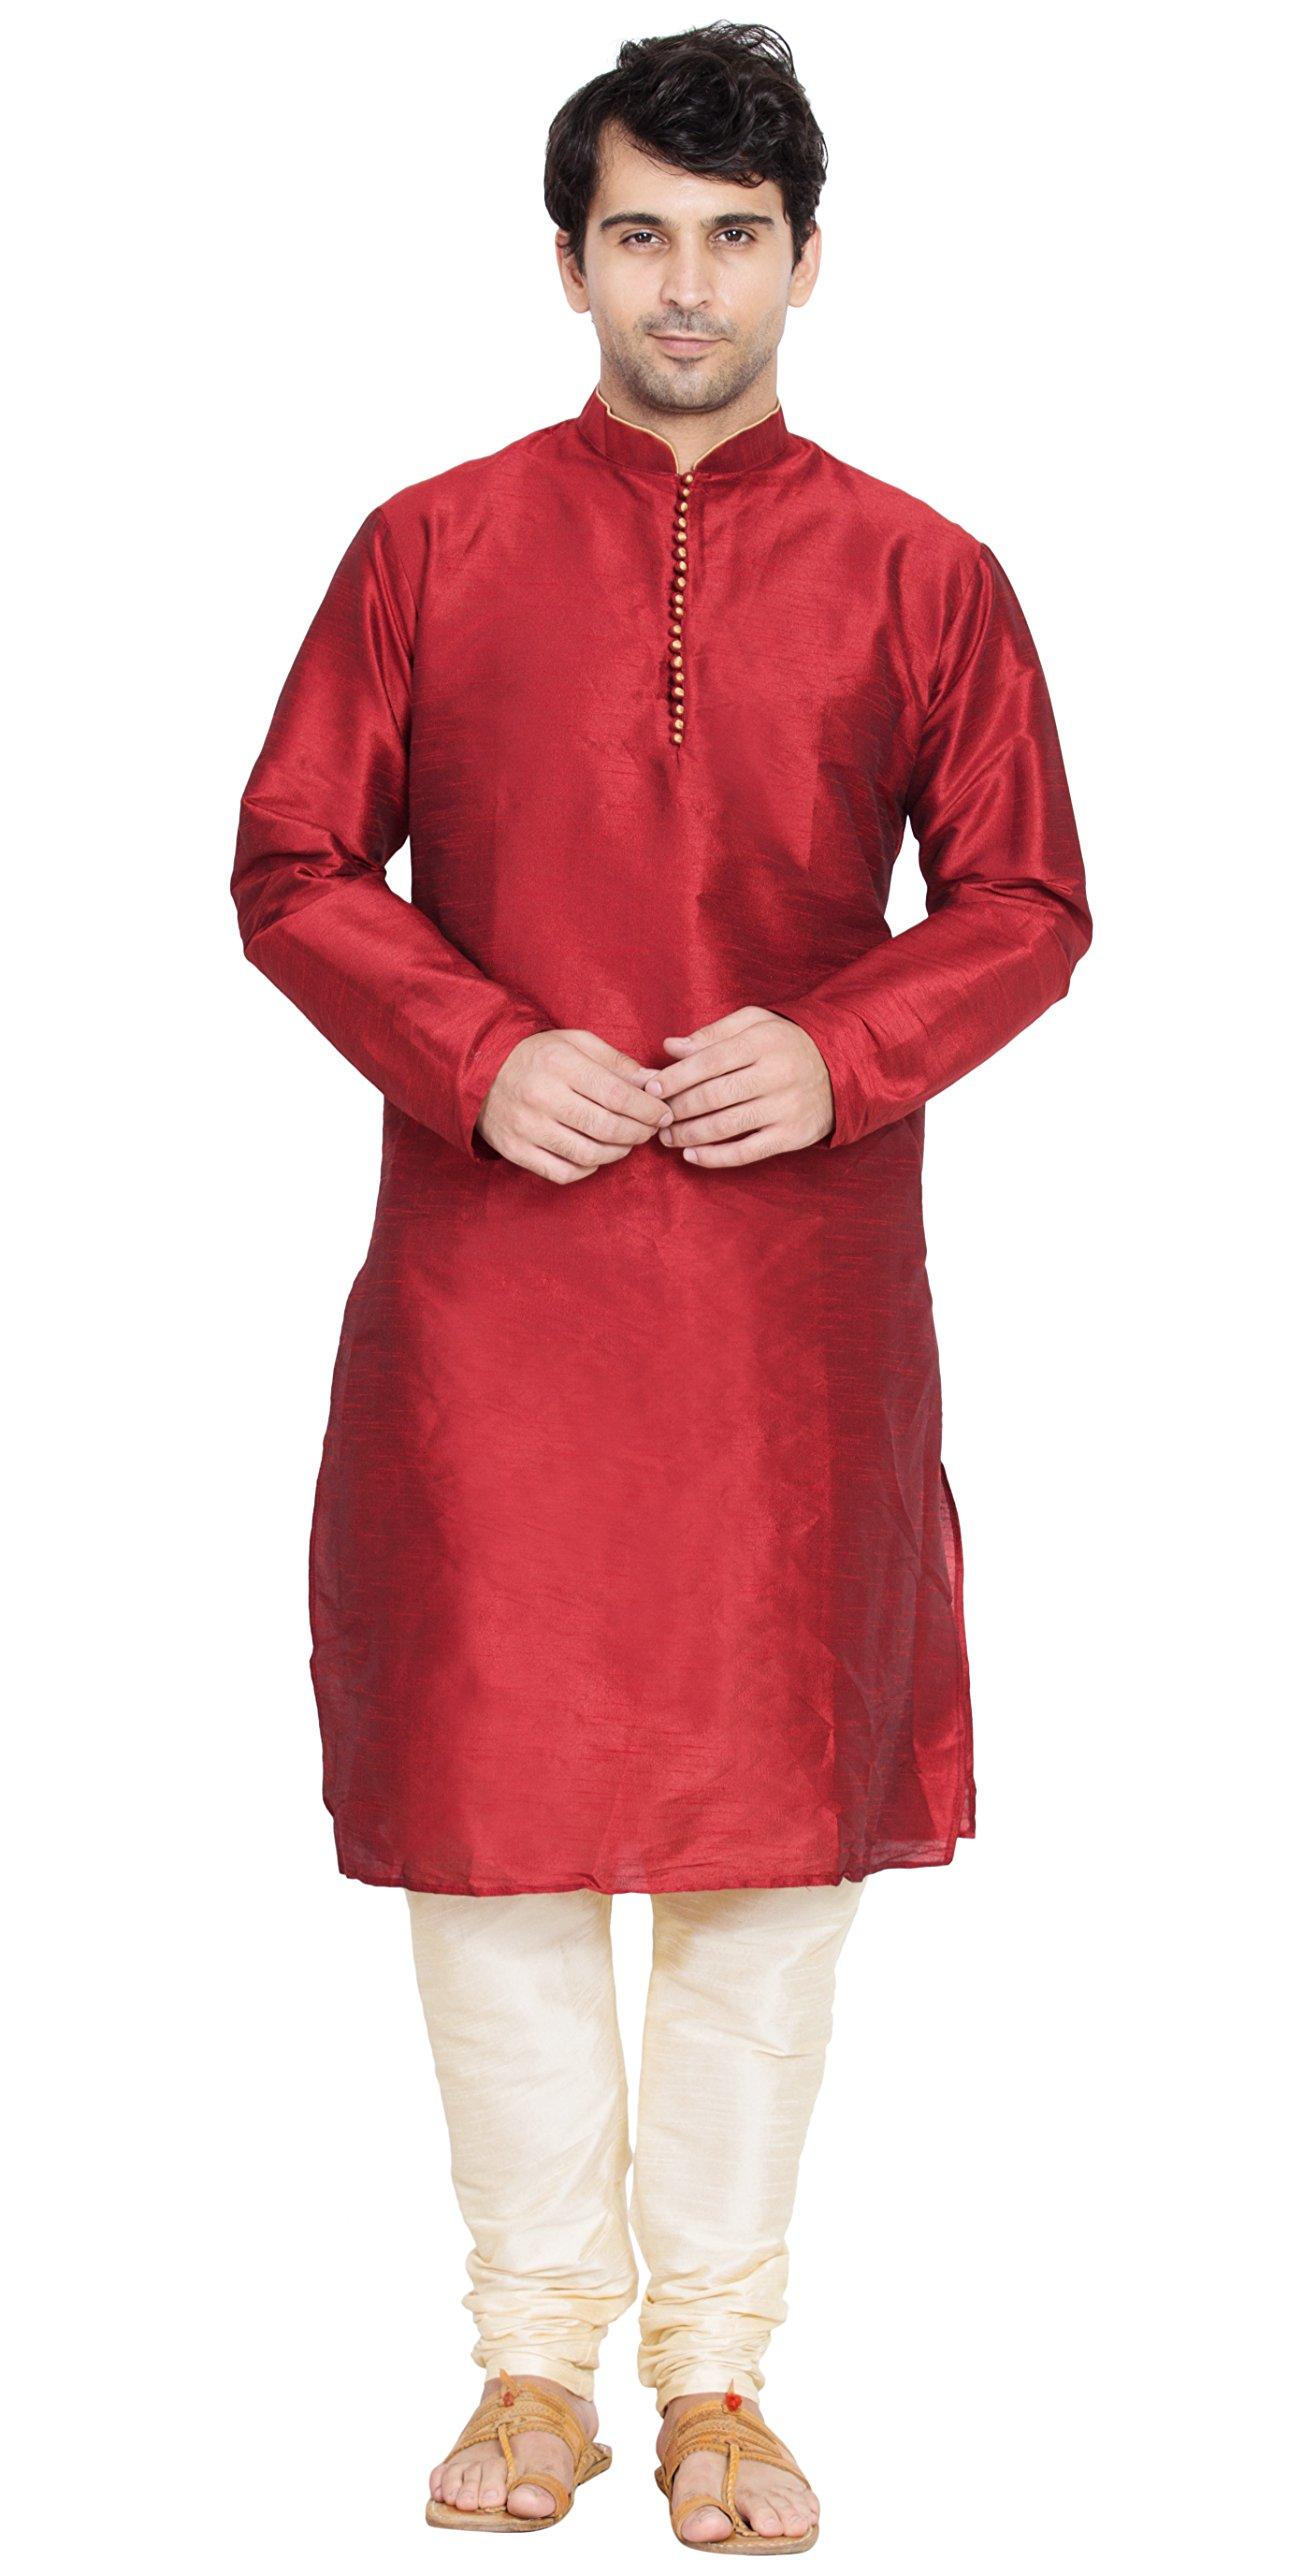 Indian Kurta Pajama Handmade Long Sleeve Shirt Traditional red Summer Dress -L